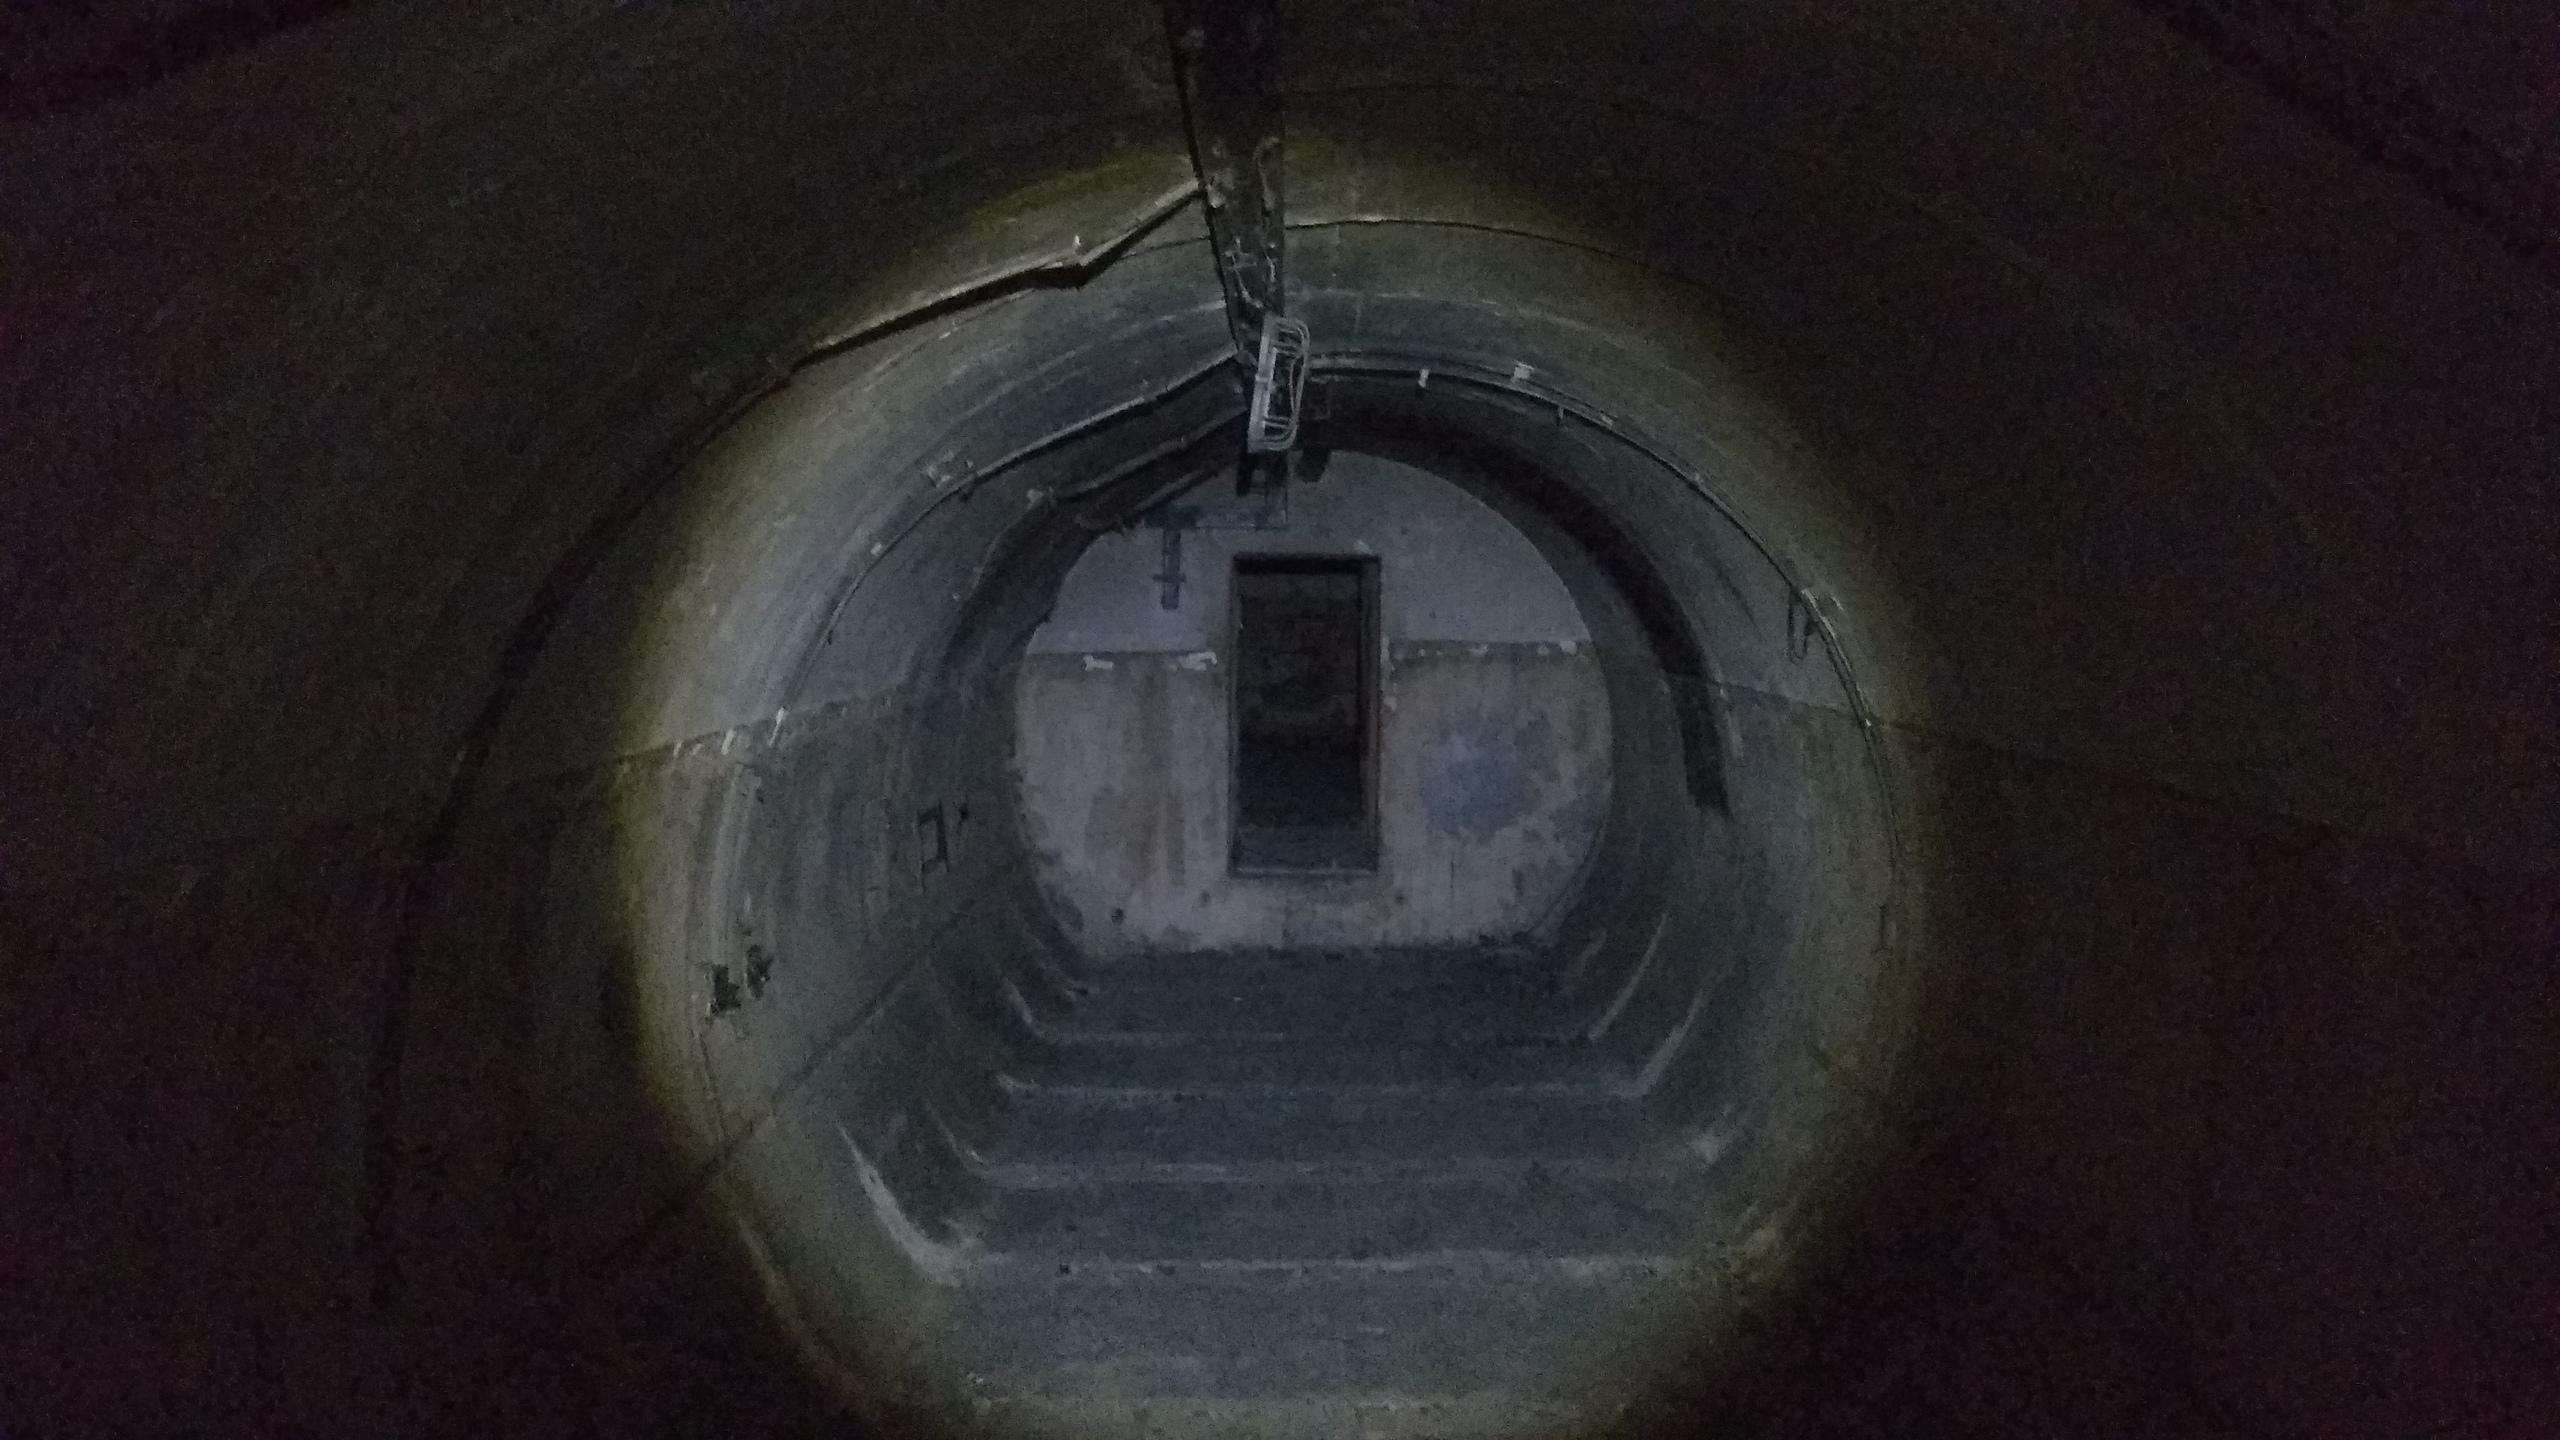 Бункеры академии связи близ деревни Дранишники